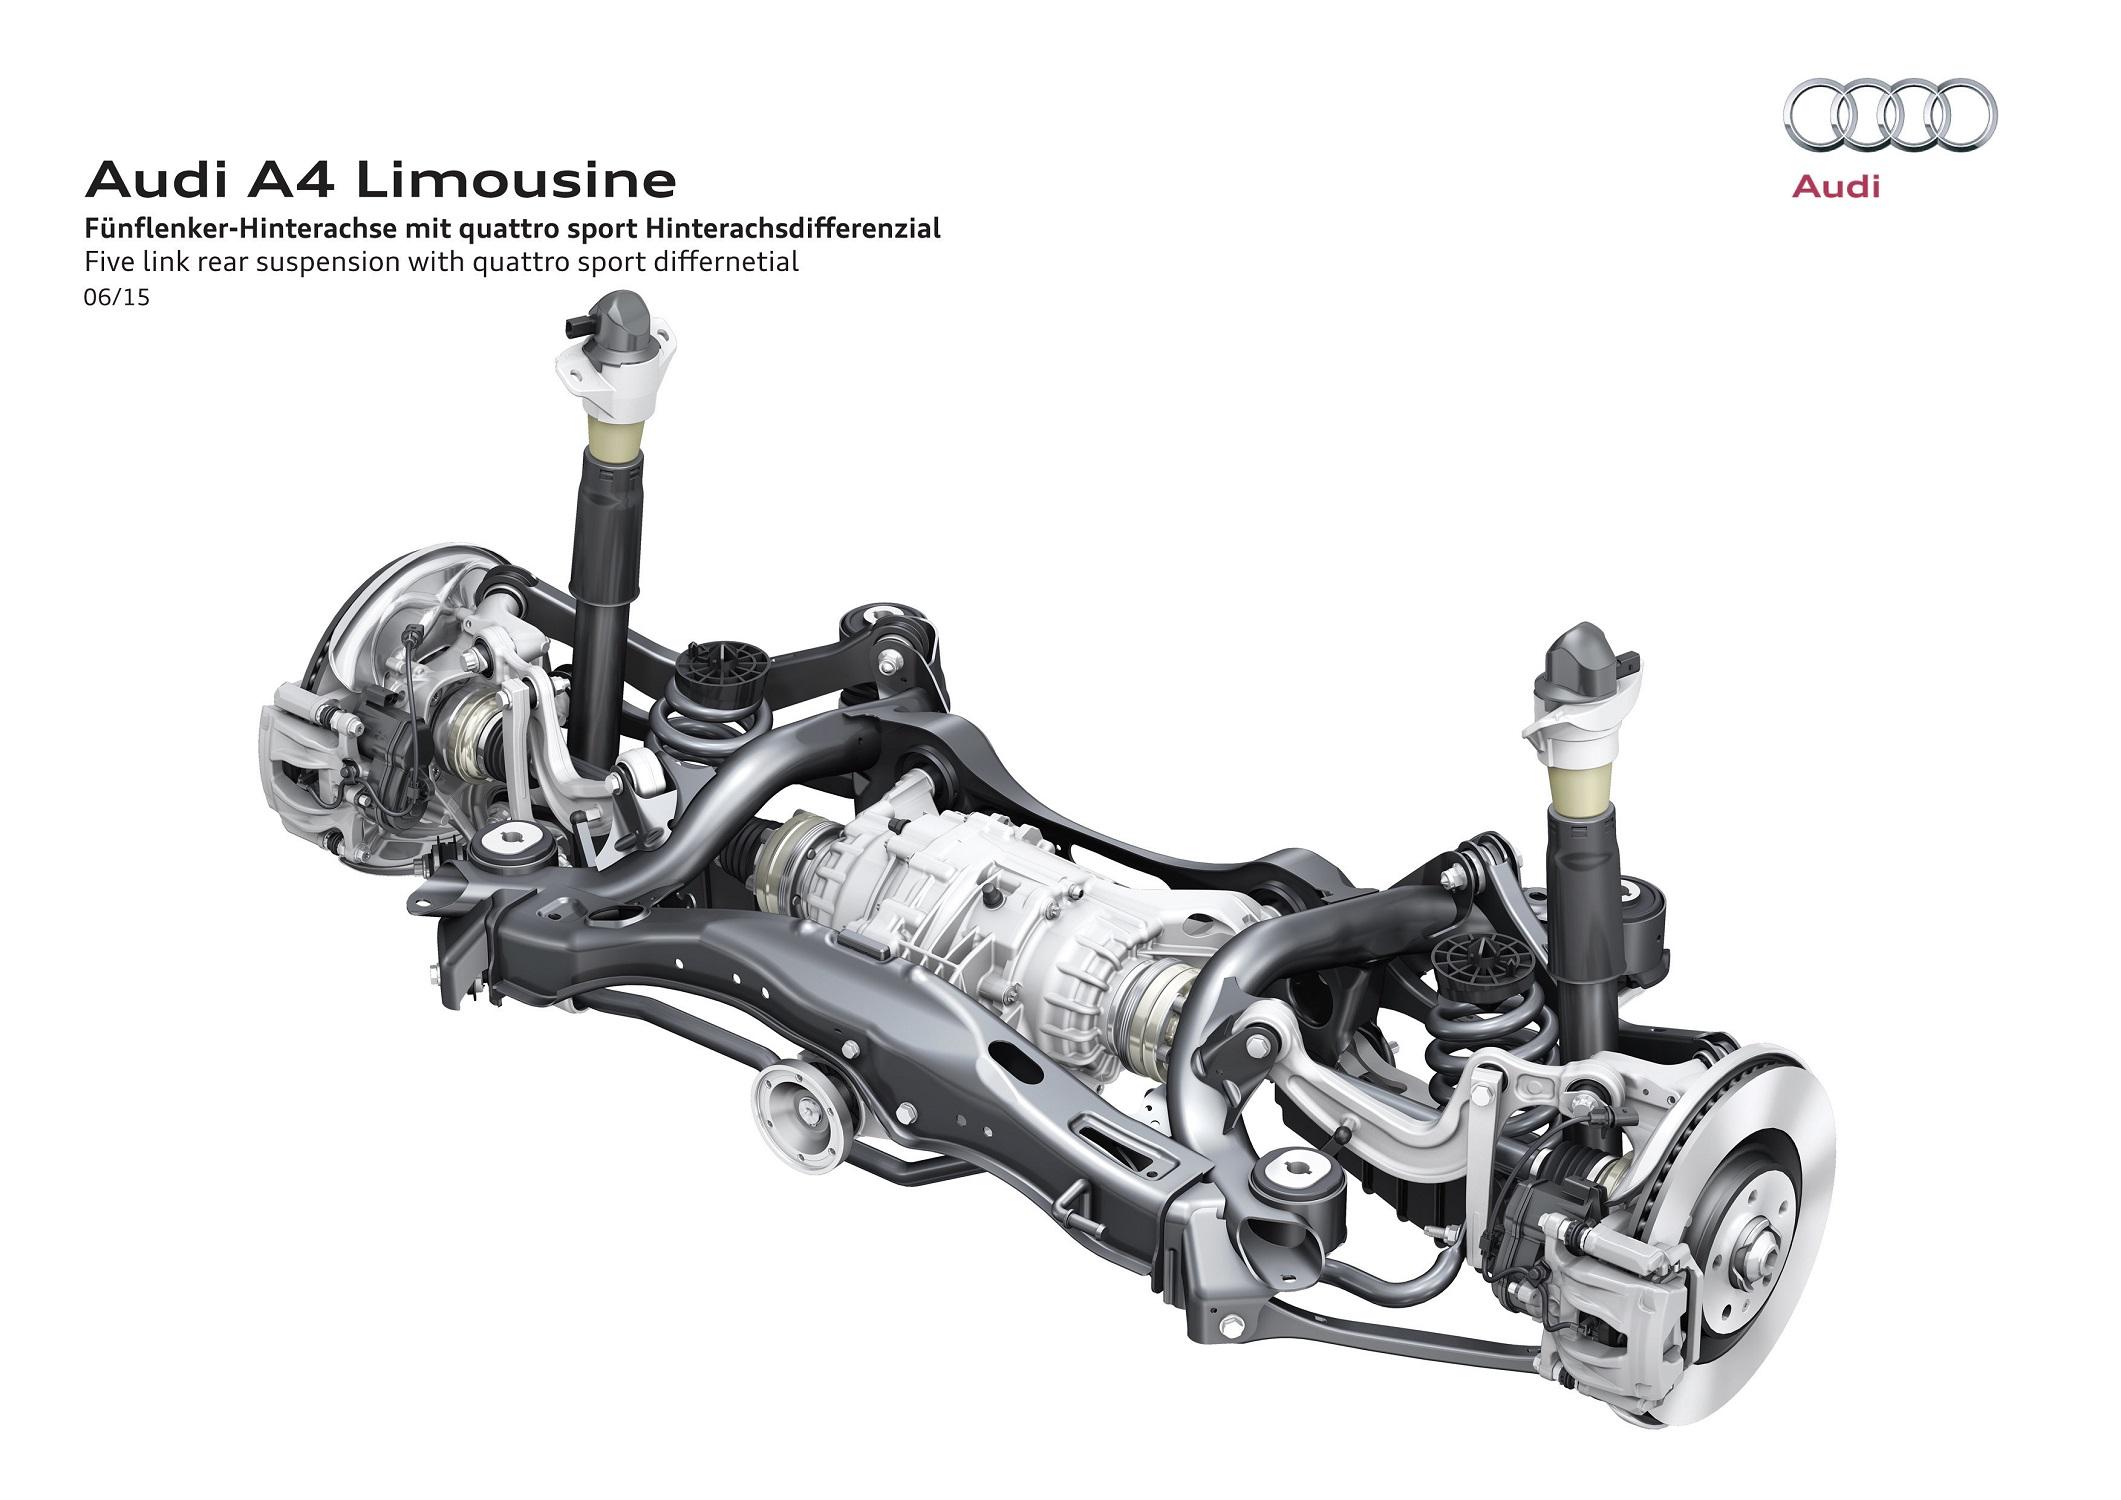 Essieu multi-bras arrière avec différentiel Quattro sport de l'Audi A4